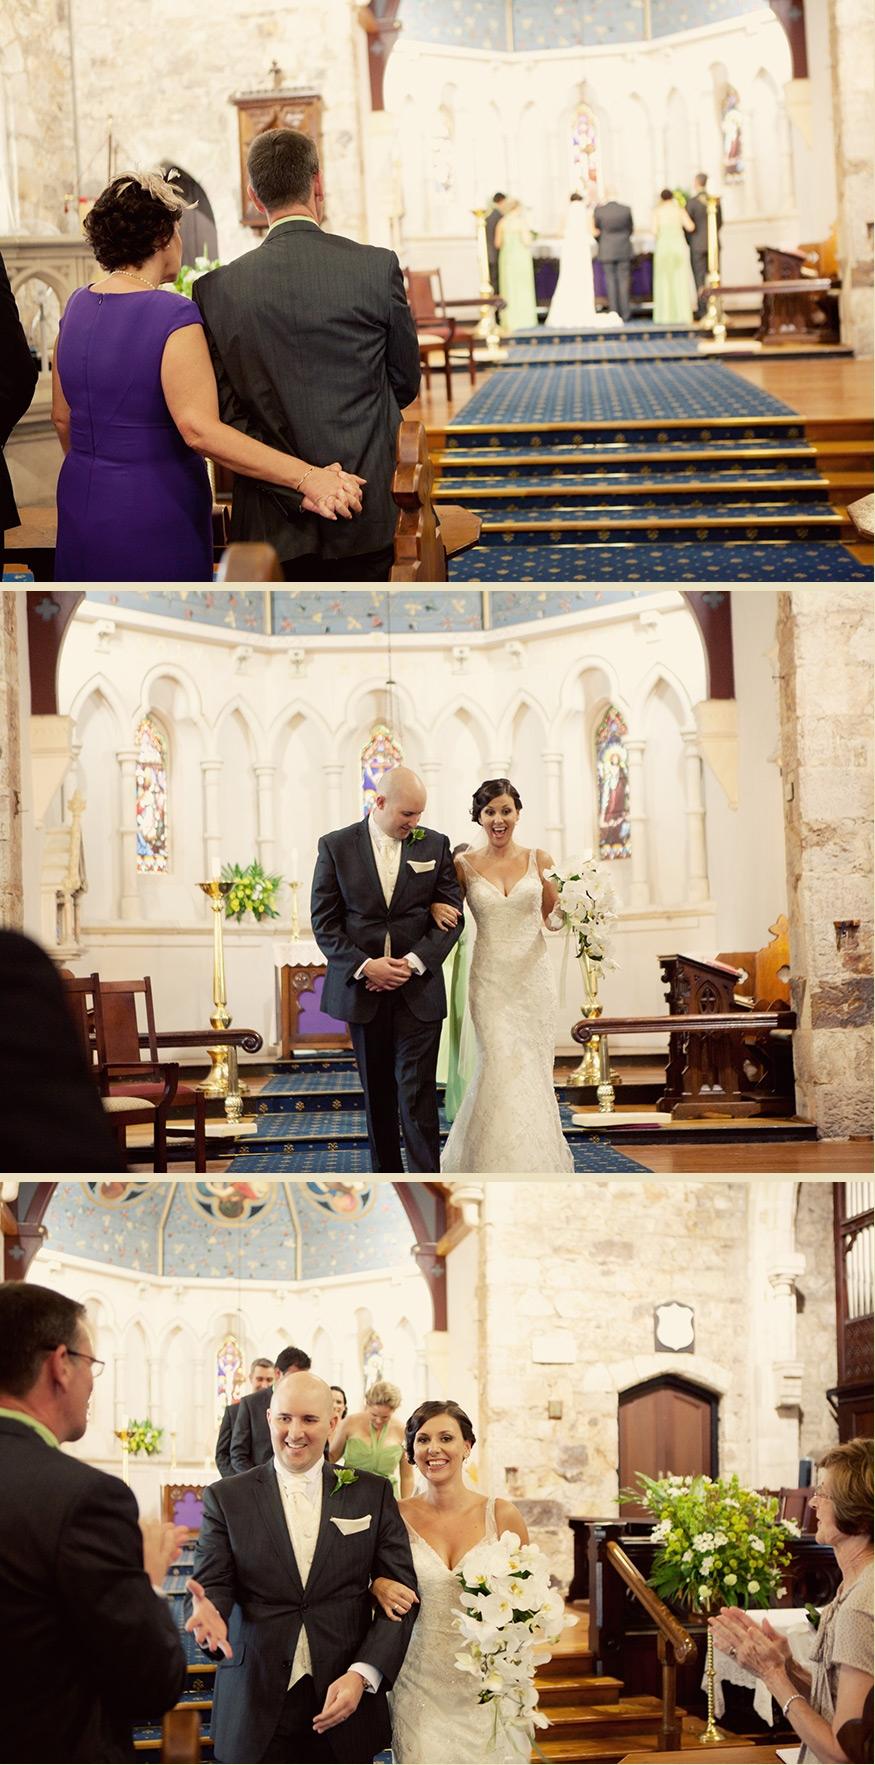 Brisbane Wedding Phoographer Blog-collage-1332894489299